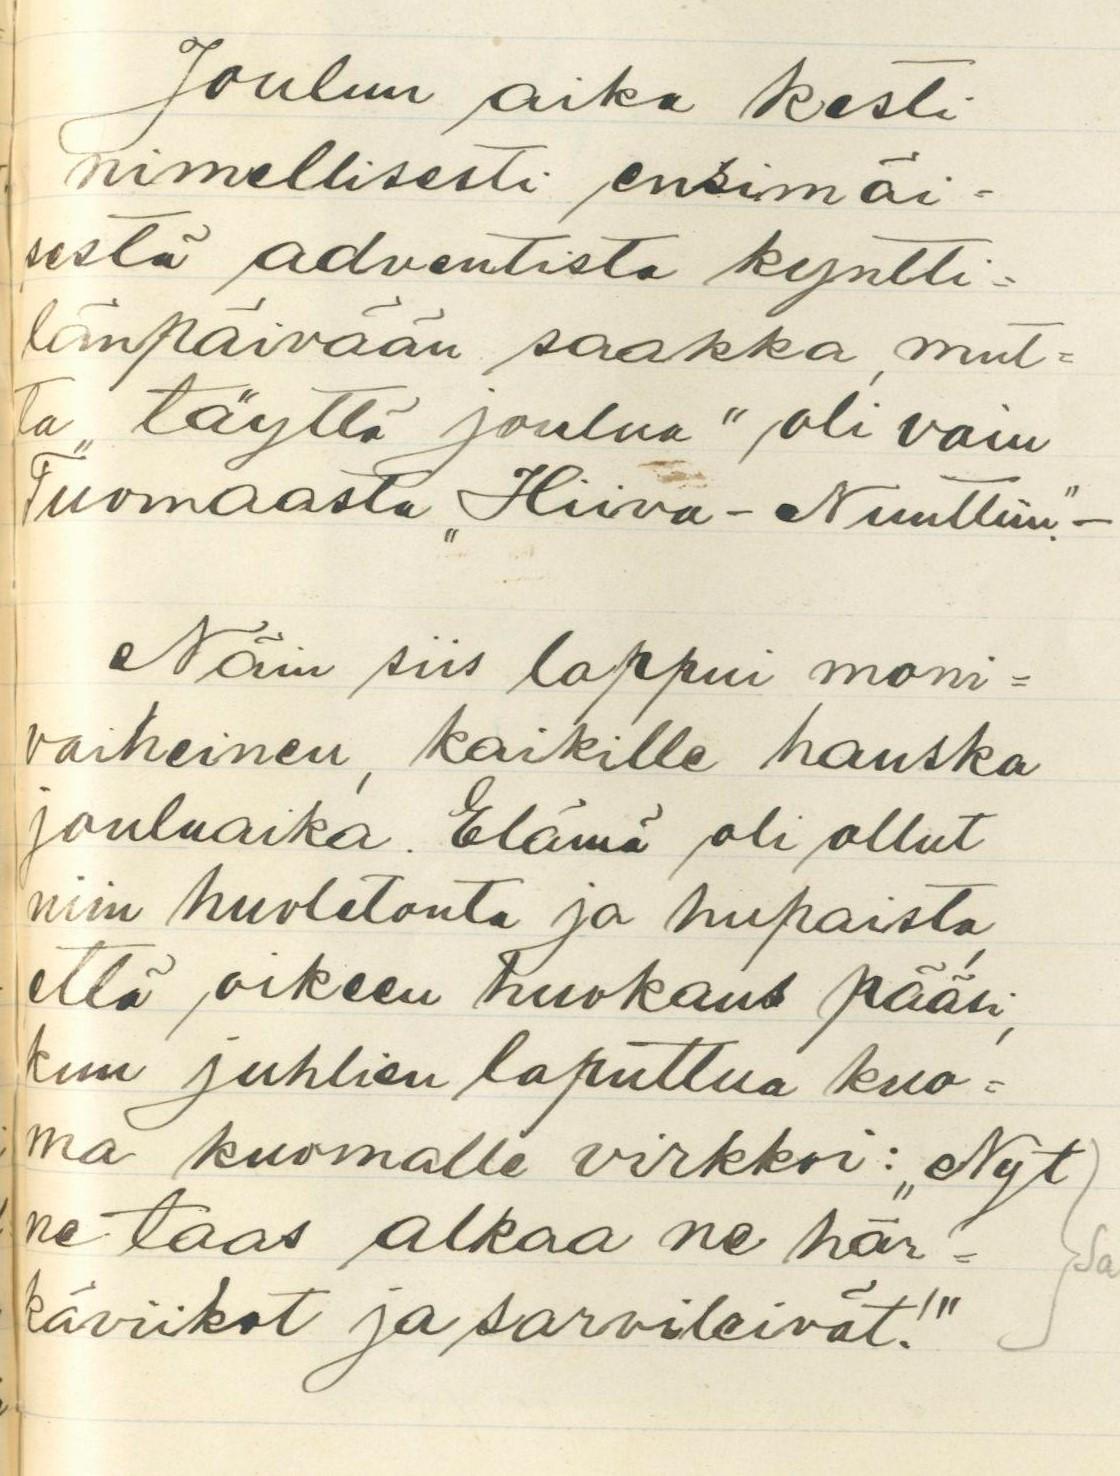 Joulun aika. Renko. Hammar, Hugo VK 13:1. 1911.